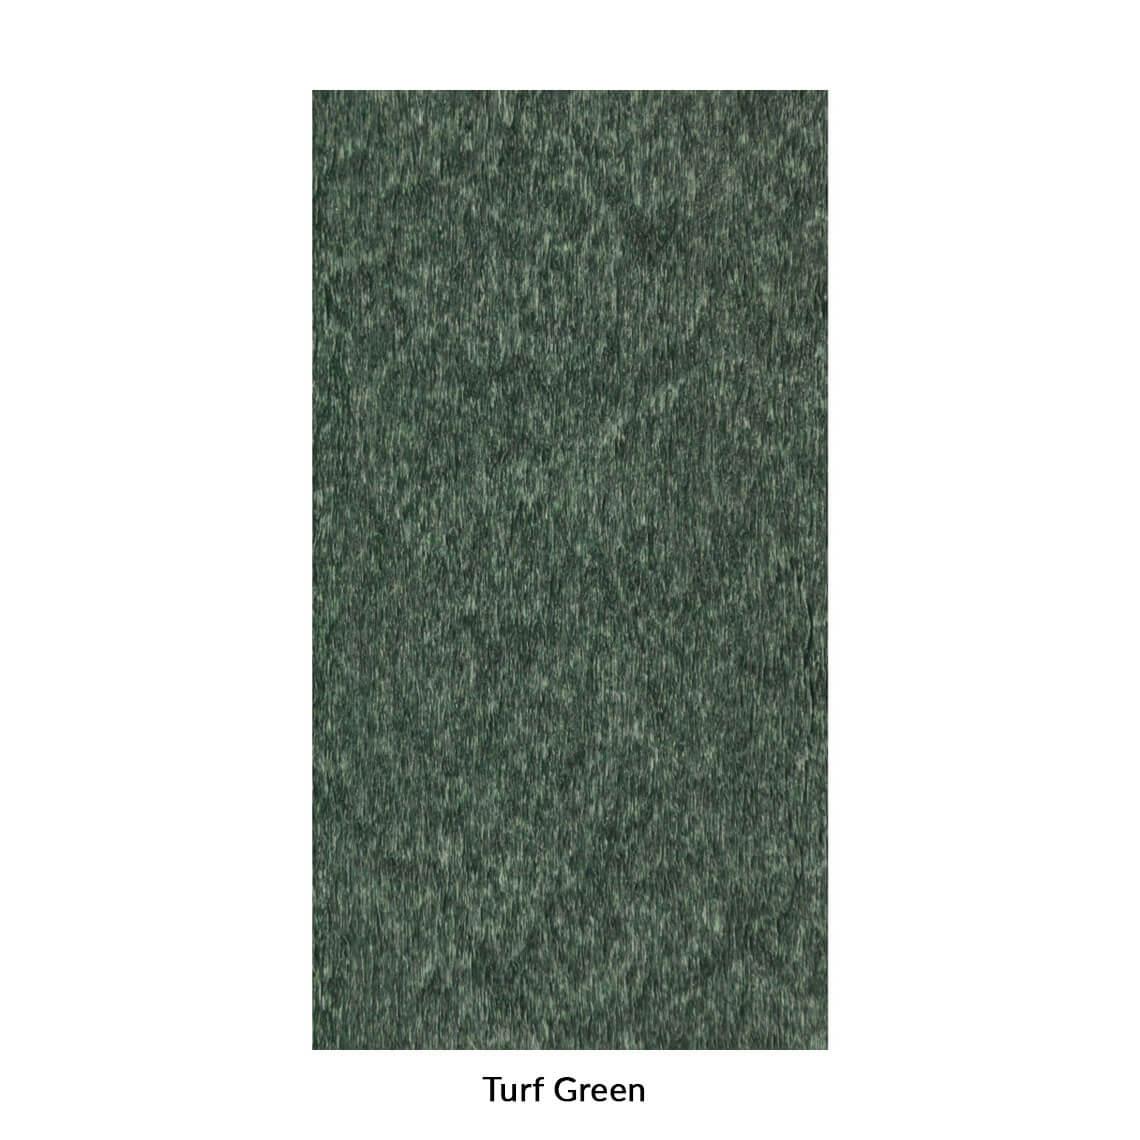 25.-turf-green.jpg